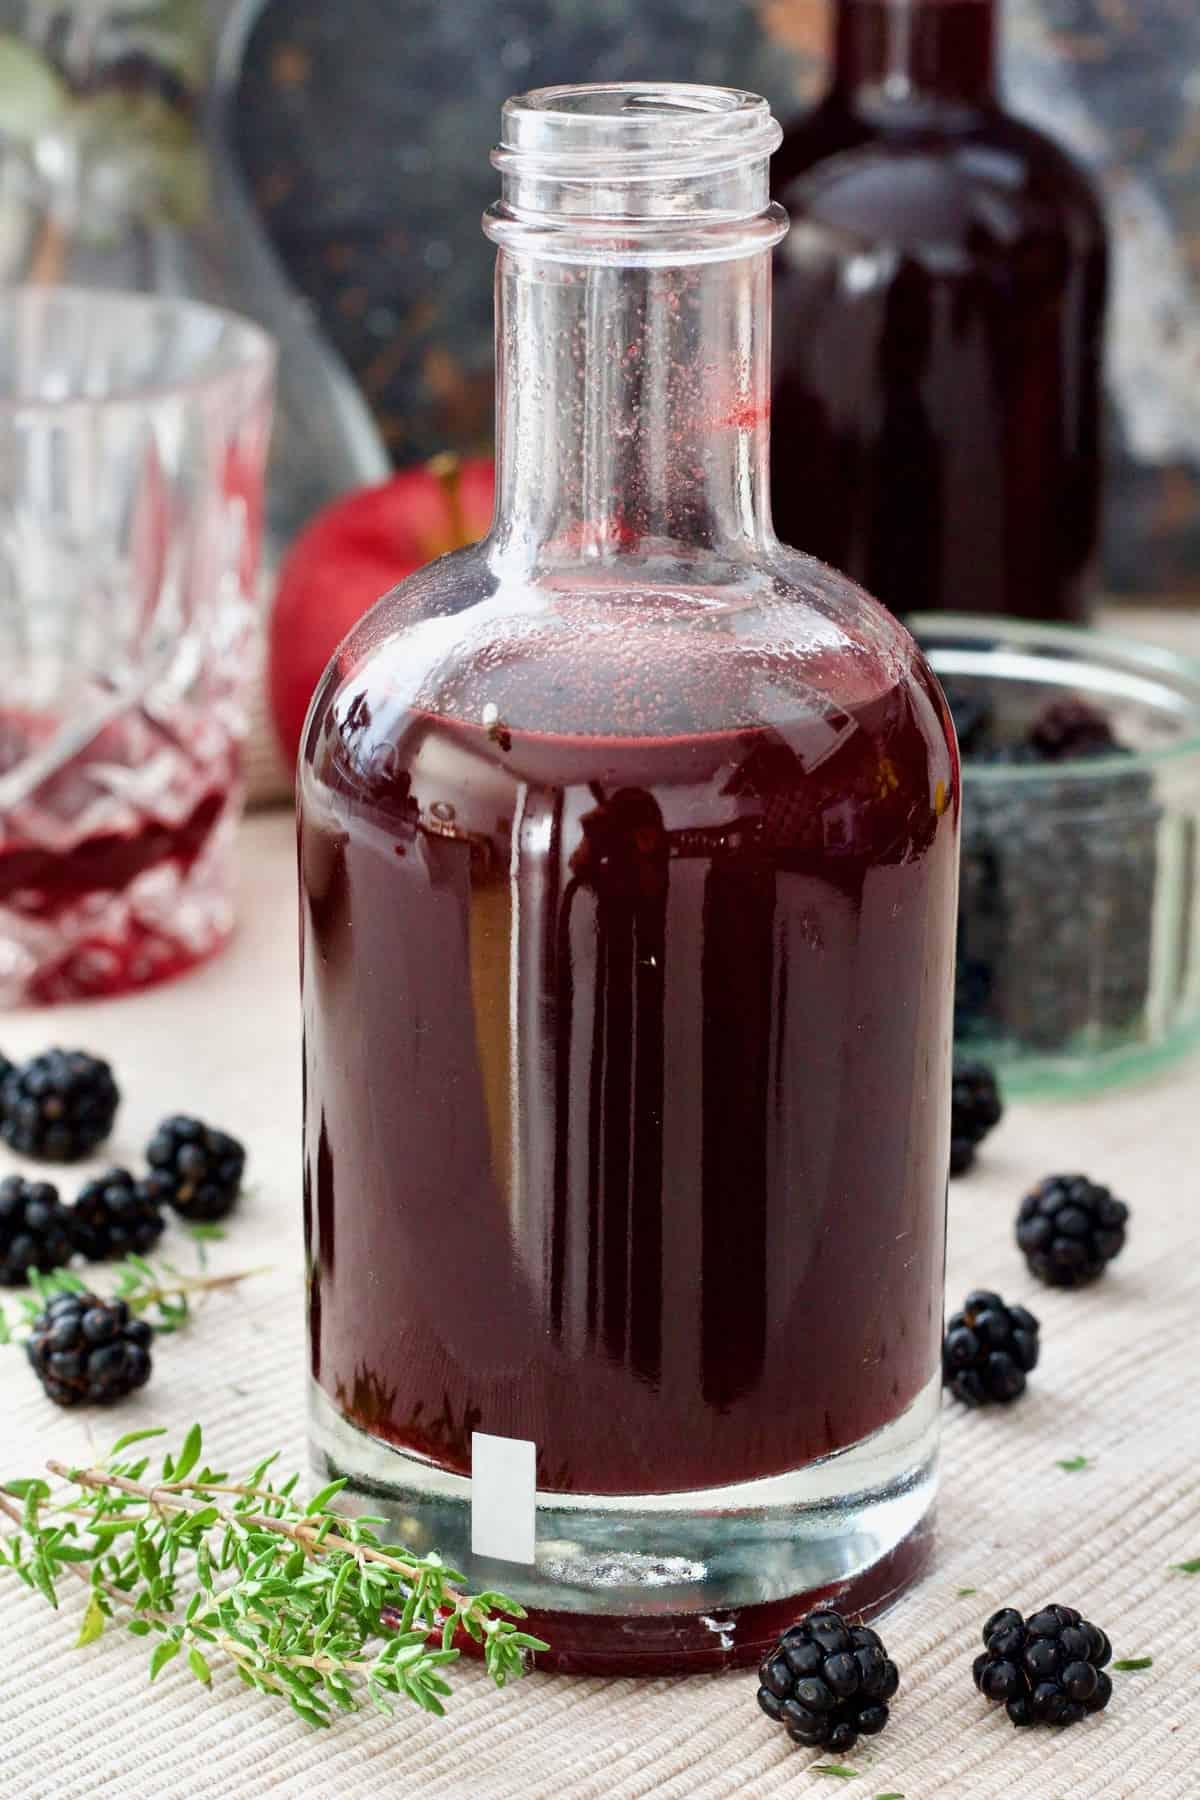 Close up of bottle with blackberry vinegar.